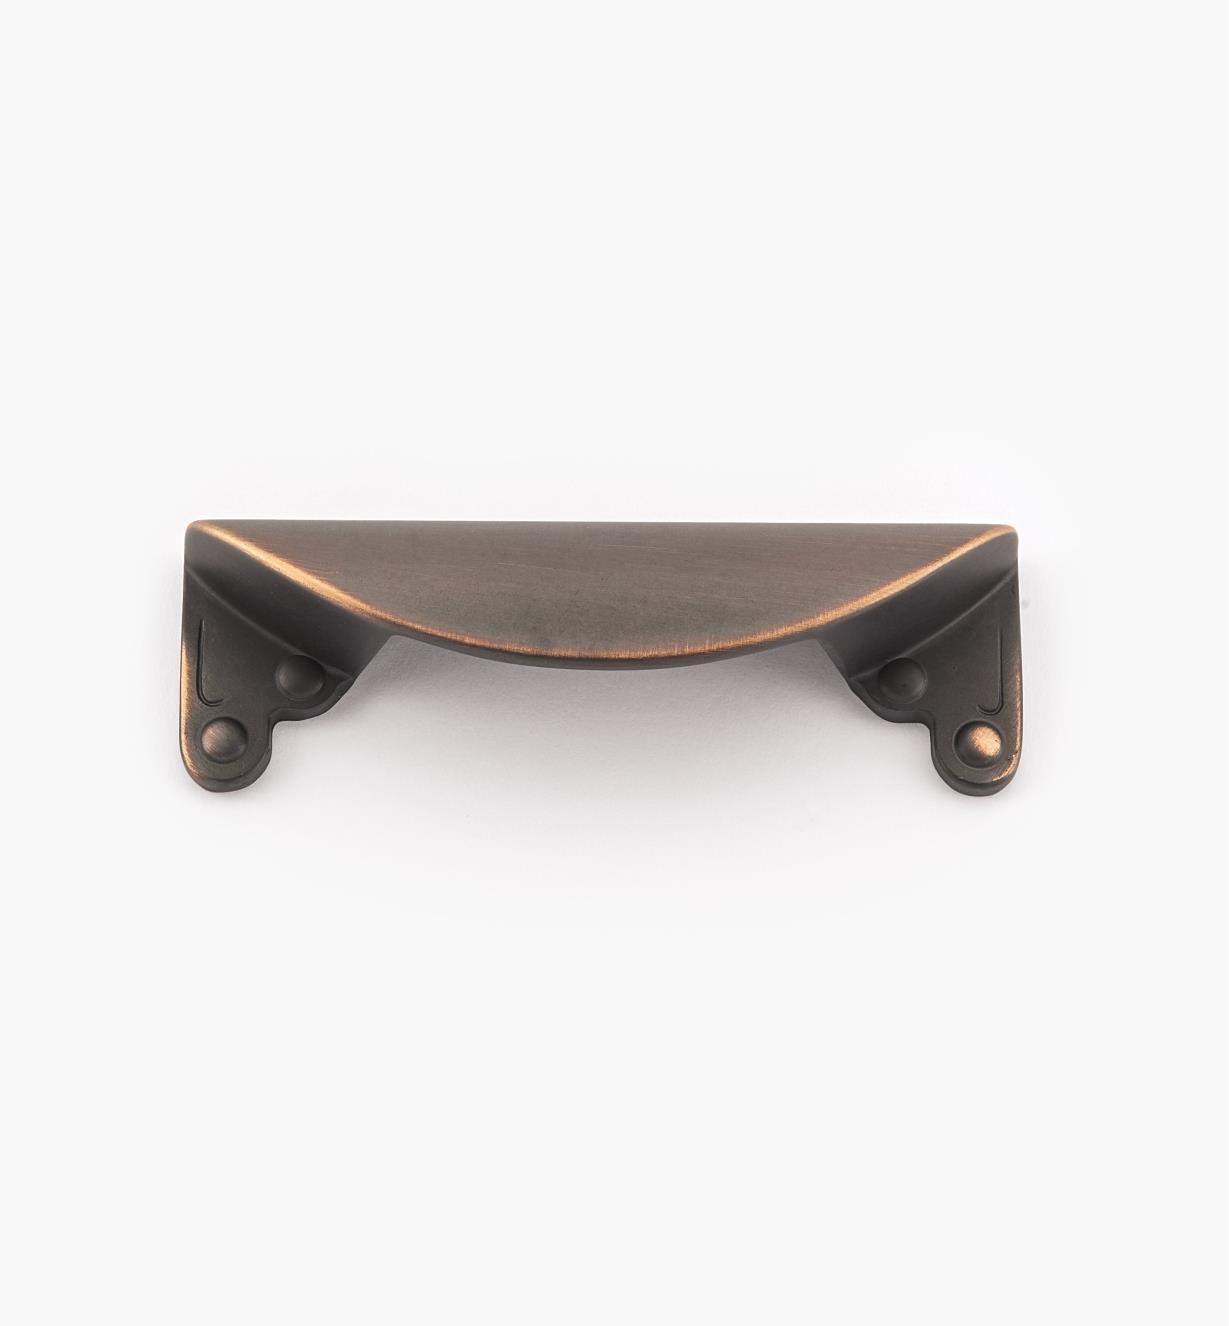 02A0832 - Grande poignée à tirette, série Inspirations, fini bronze huilé